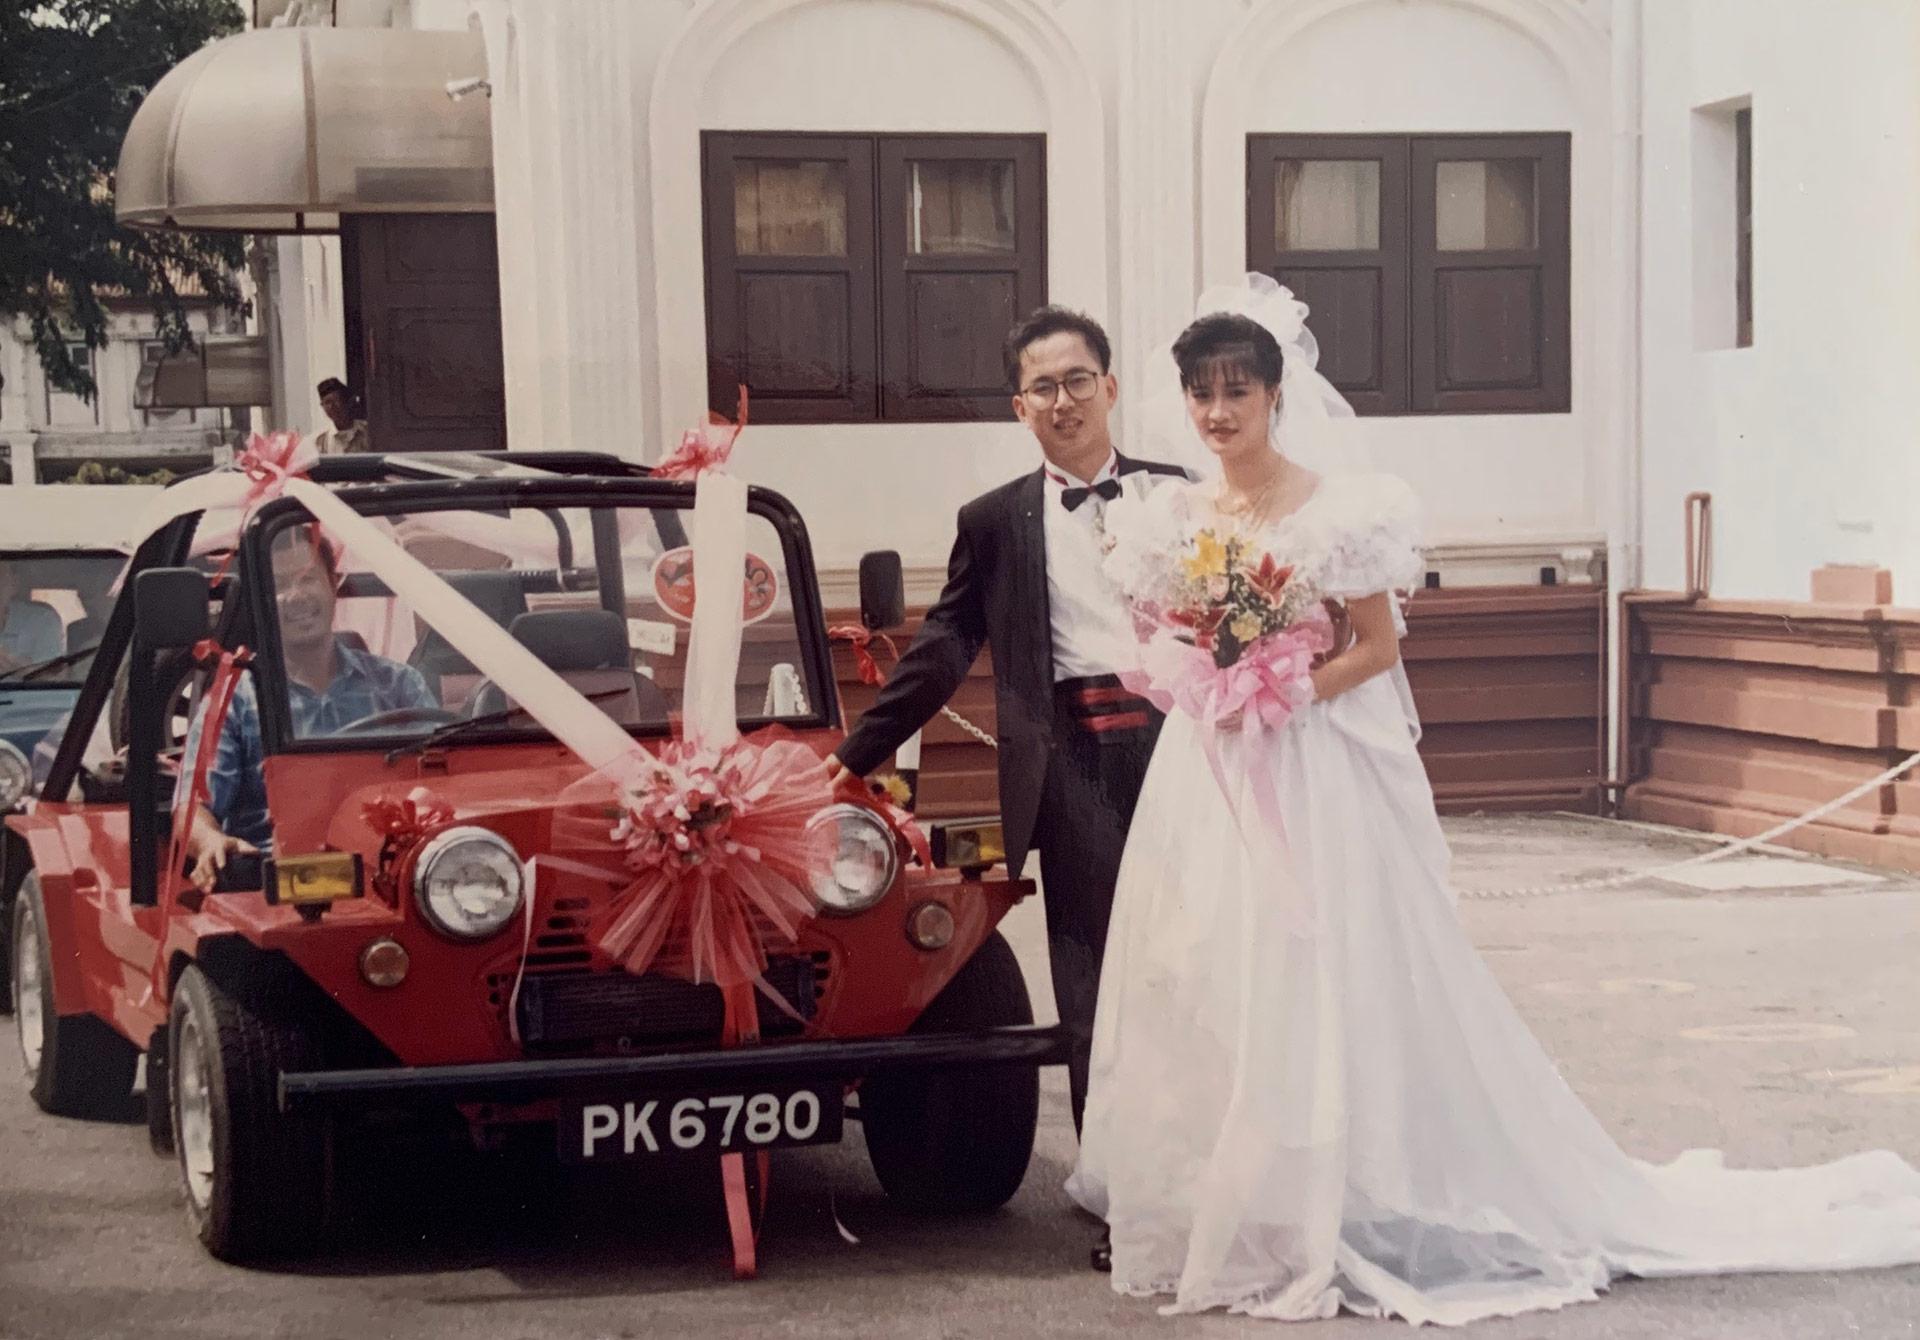 Jocelyn Yow's parents at their wedding in Malaysia. | Courtesy of Jocelyn Yow